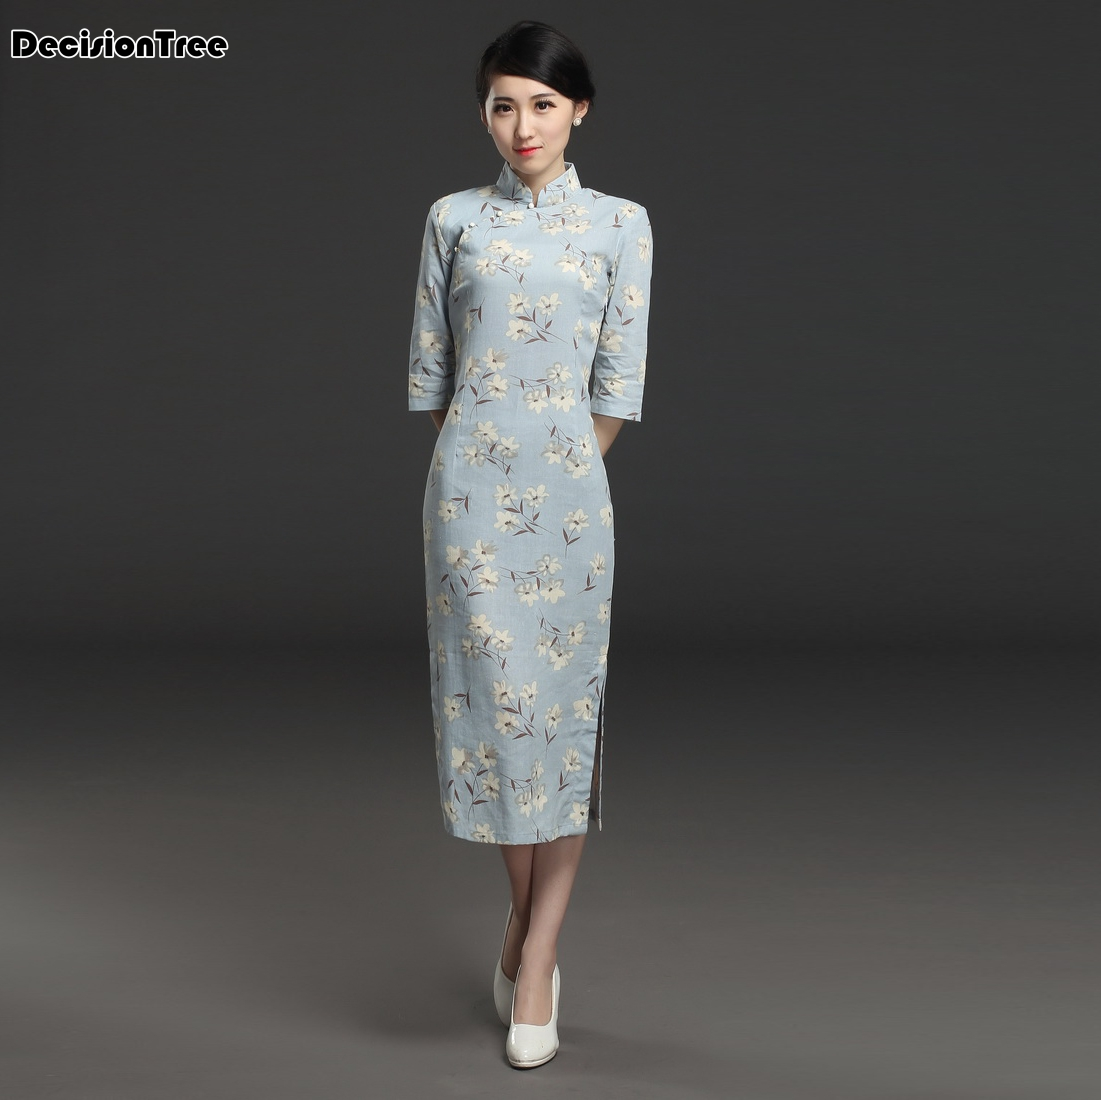 2019 Cheongsam Floral Qipao Chinese Traditional Dress Women's Satin Cheongsam Qipao Short Sleeve Long Dress Flower Print